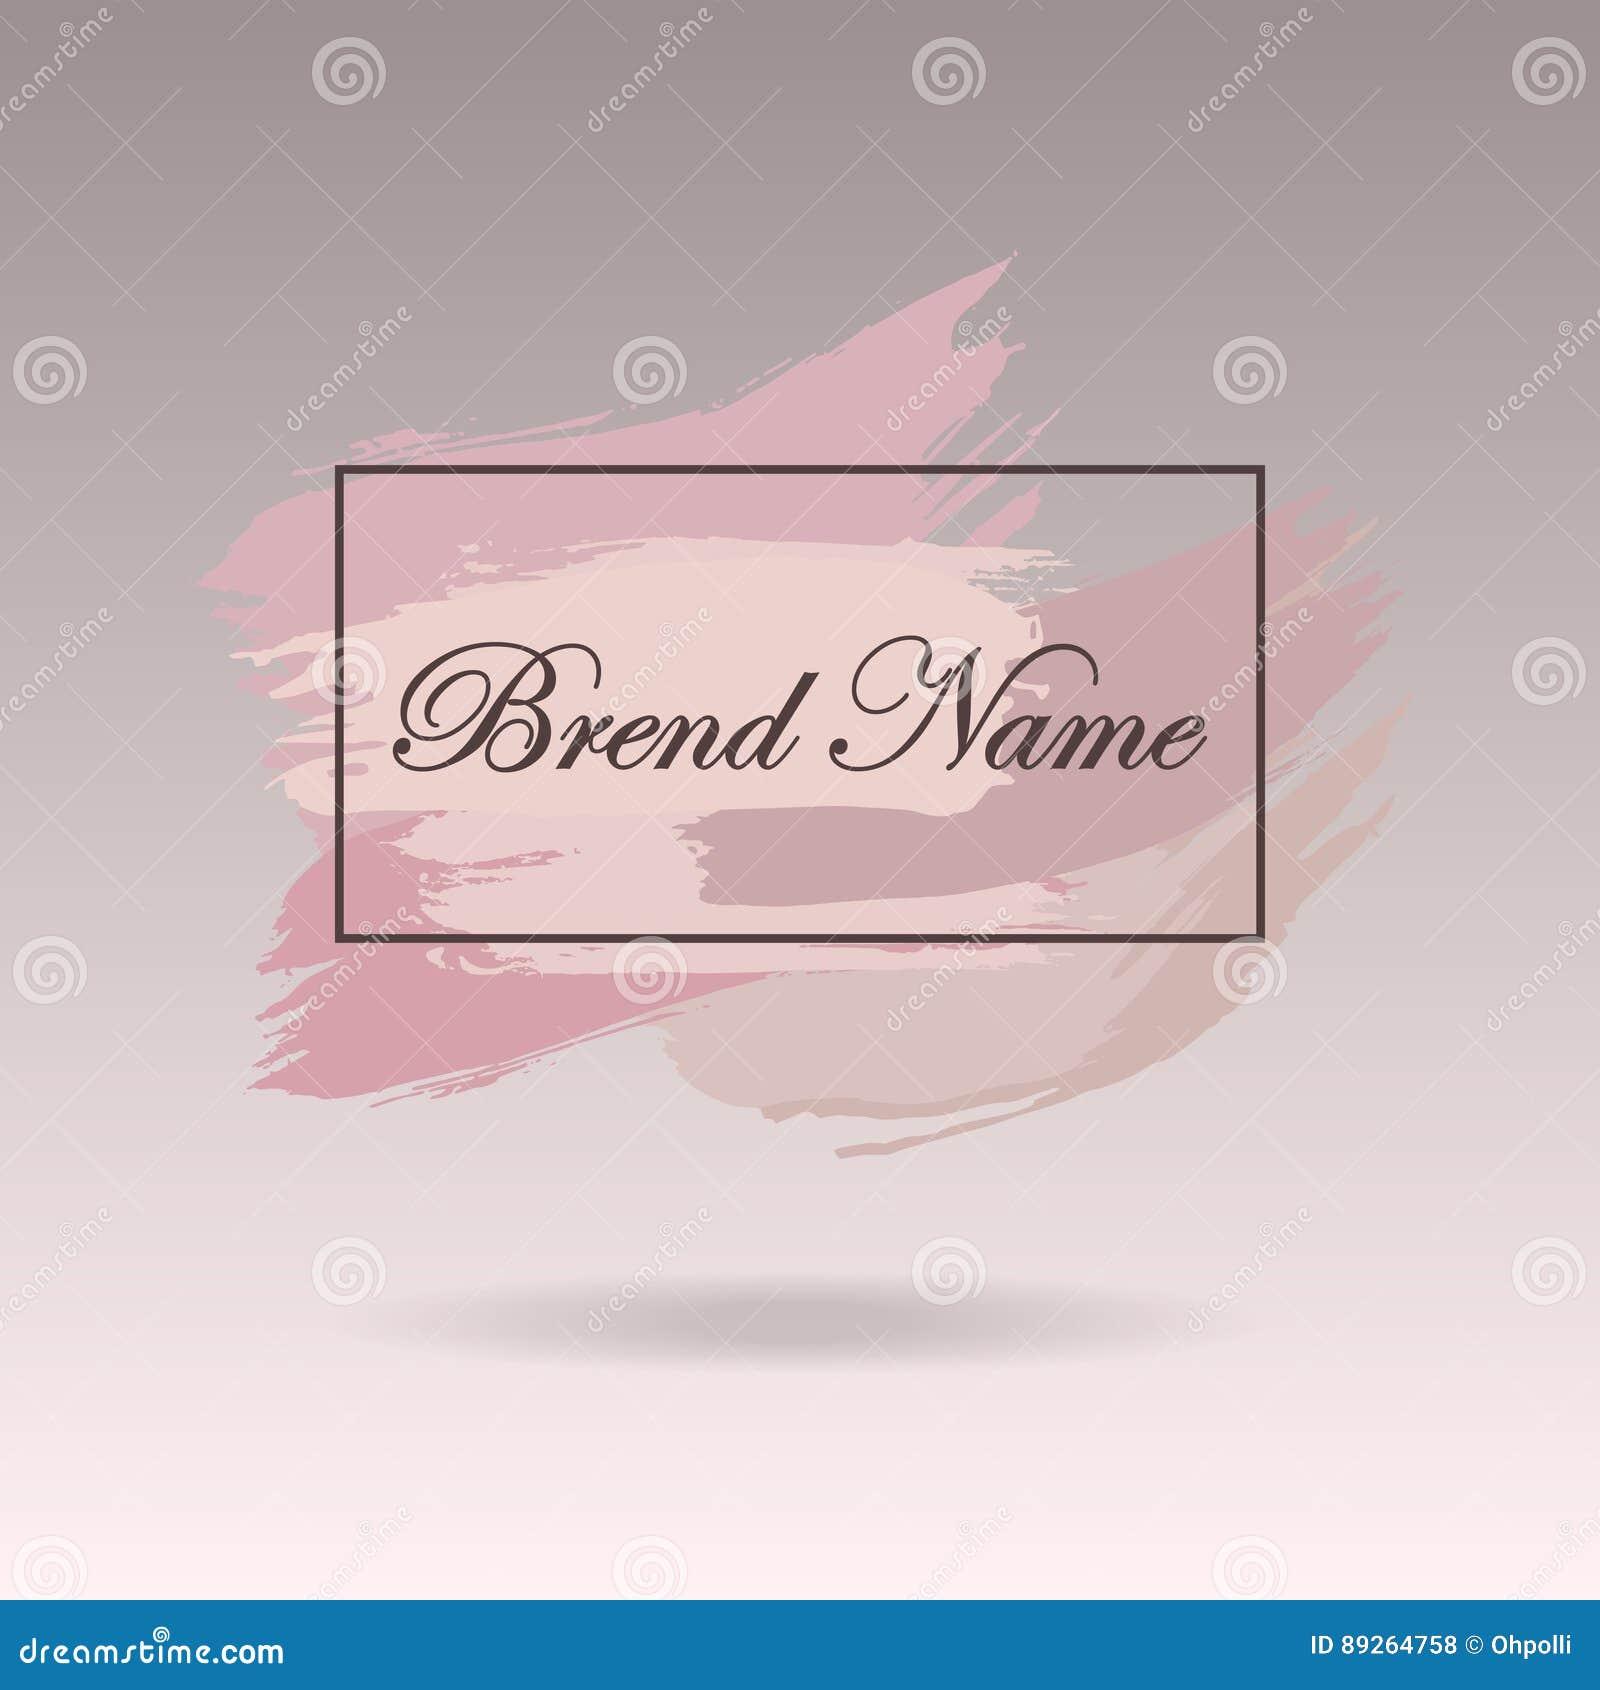 Pre-made Logo Design, Banner And Watermark  Artistic Brushes Design